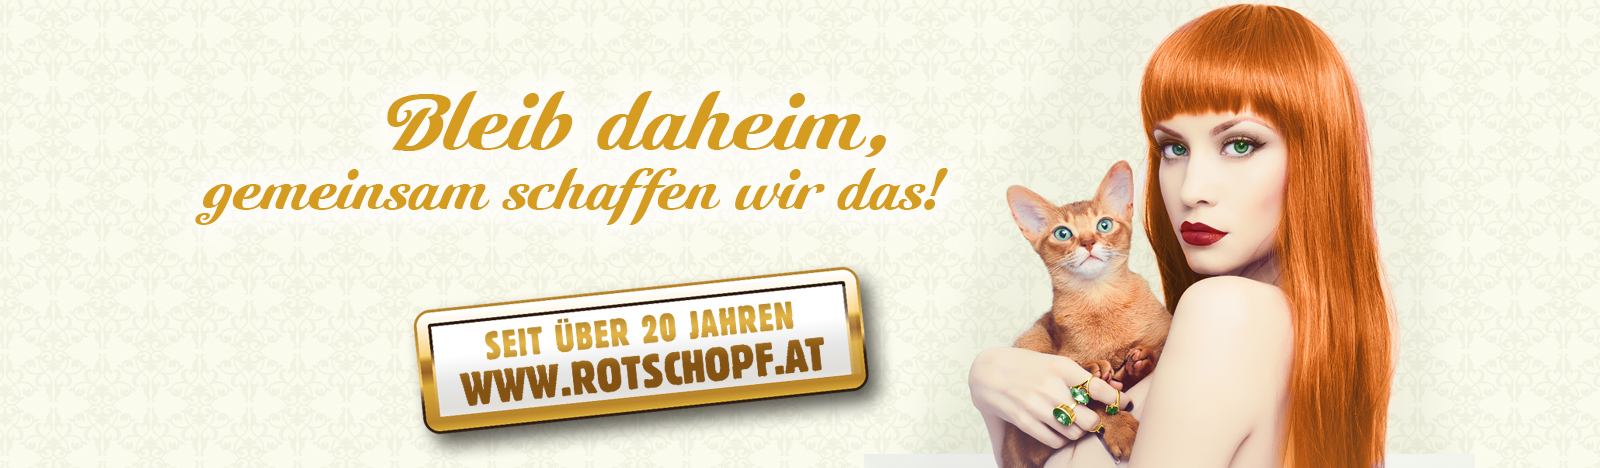 Rotschopf-bleib-daheim-2020